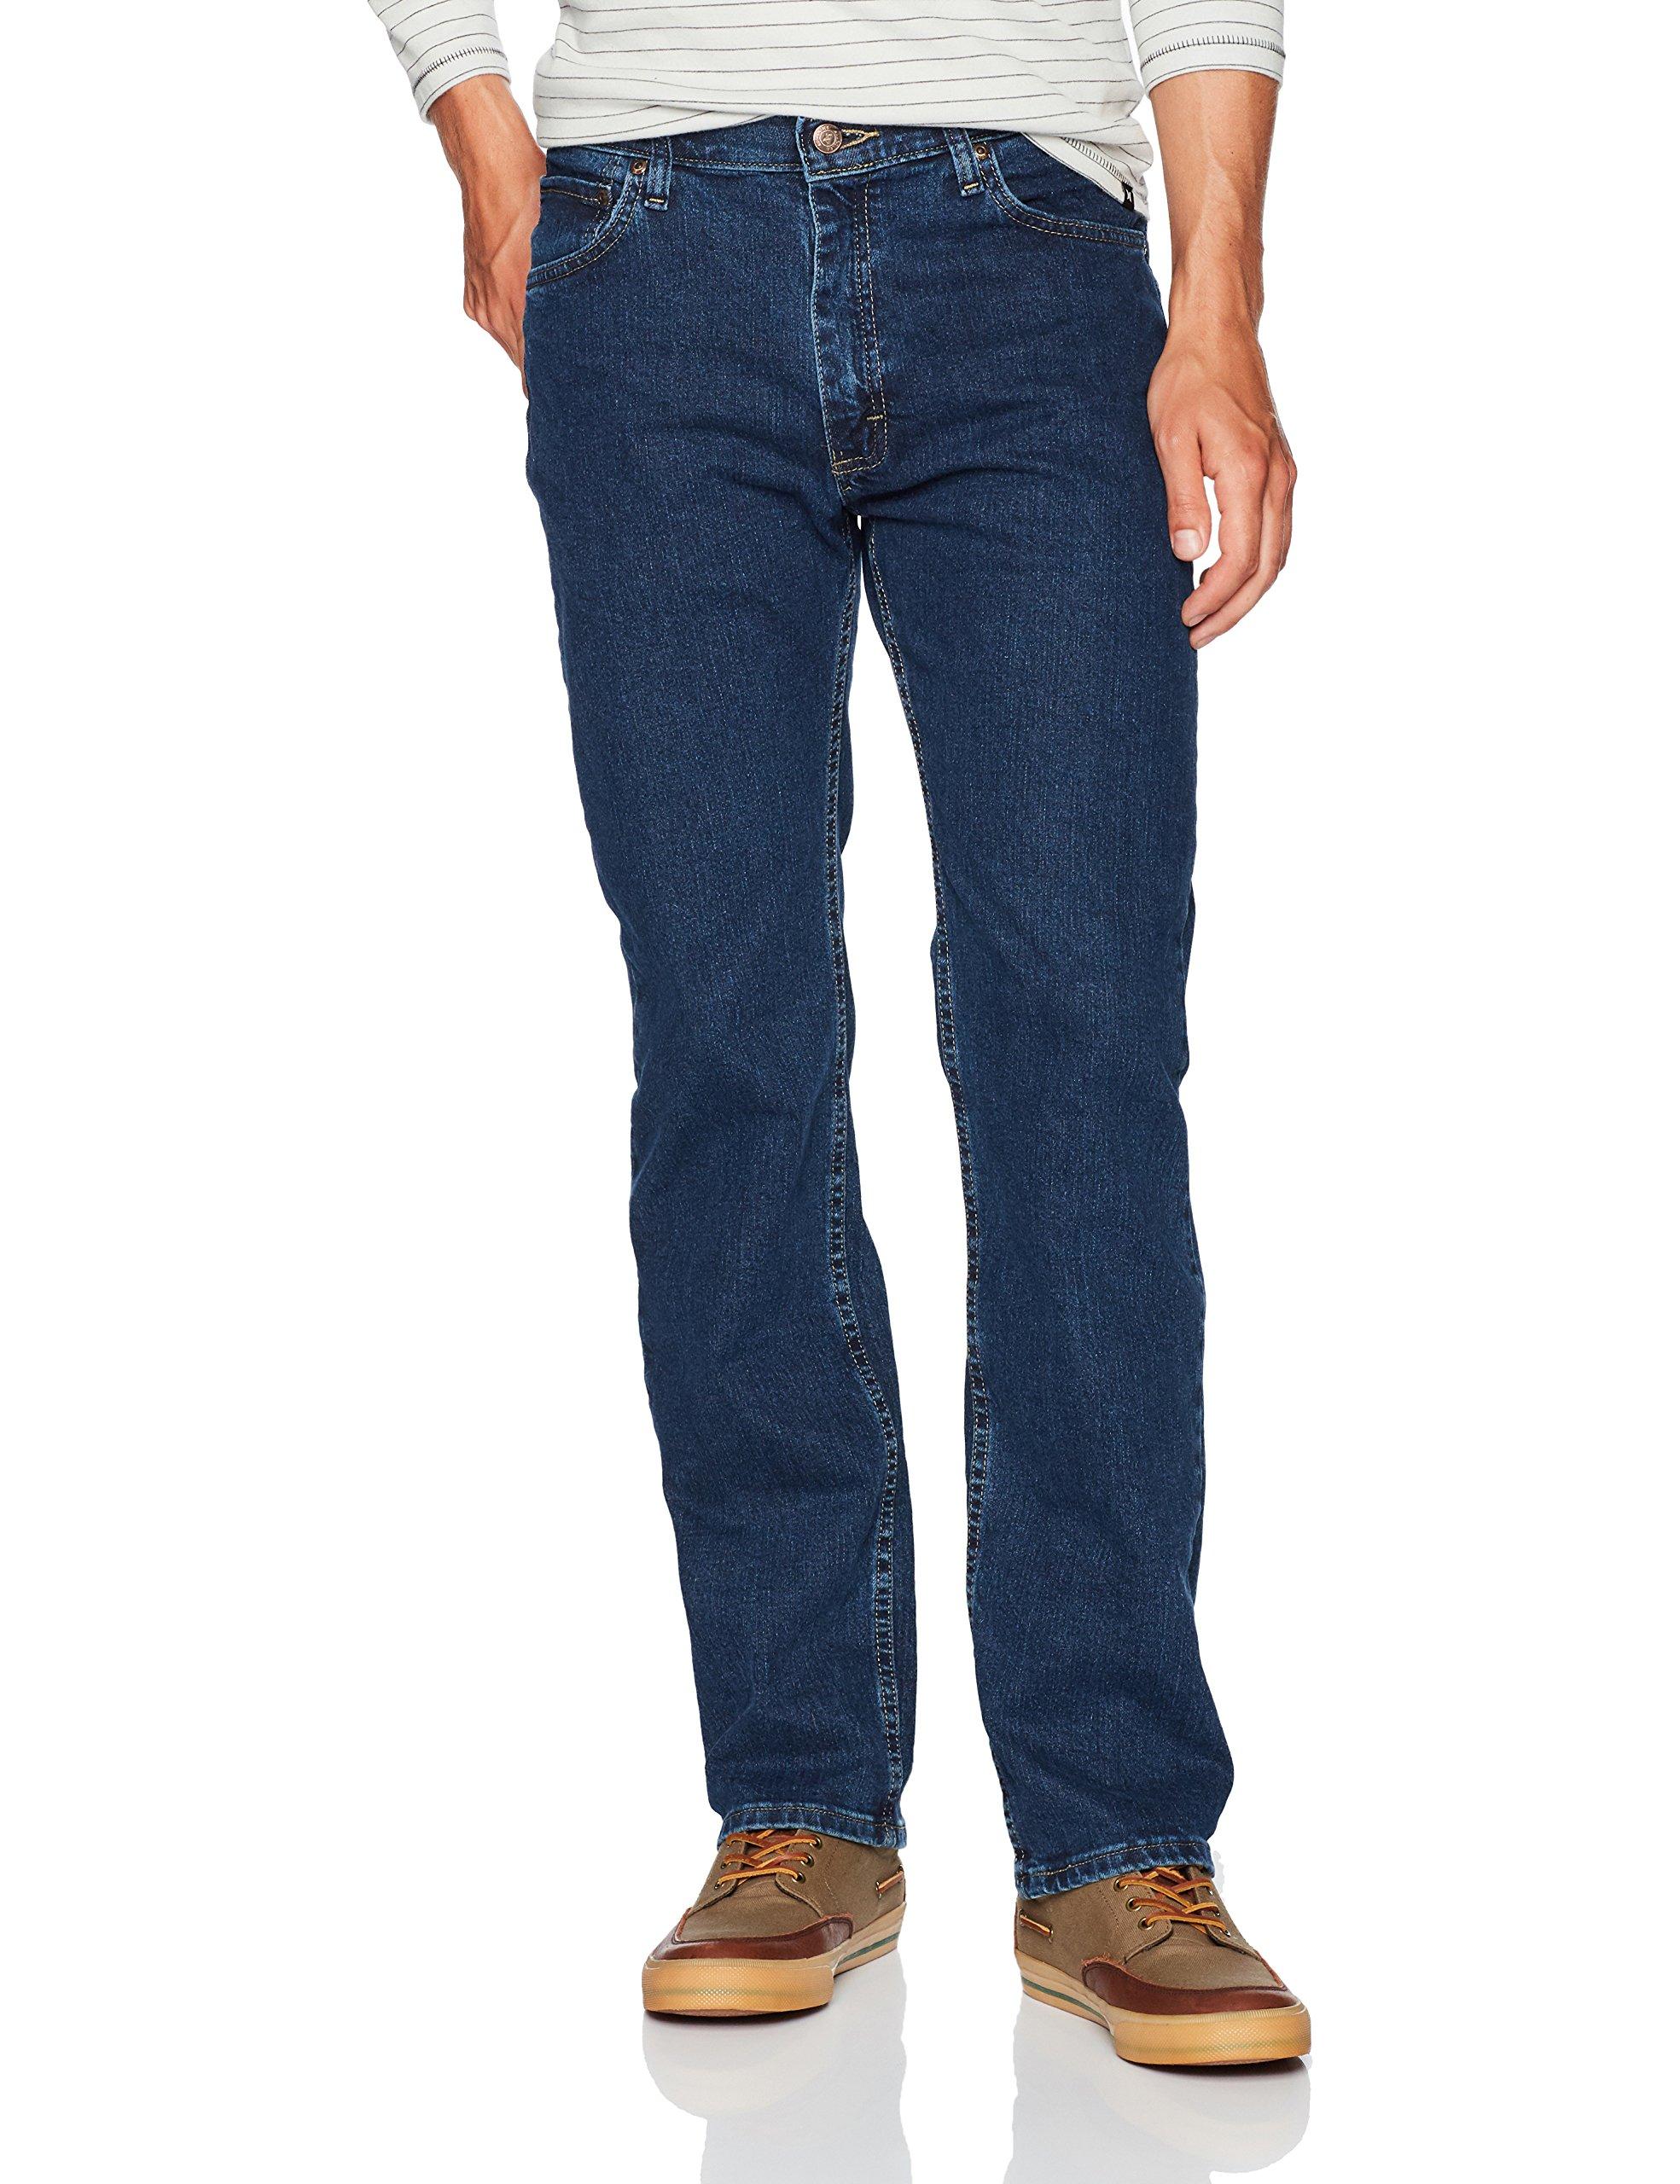 Wrangler Men's Authentics Comfort Flex Waist Jean, Dark Stonewash, 36X30 by Wrangler